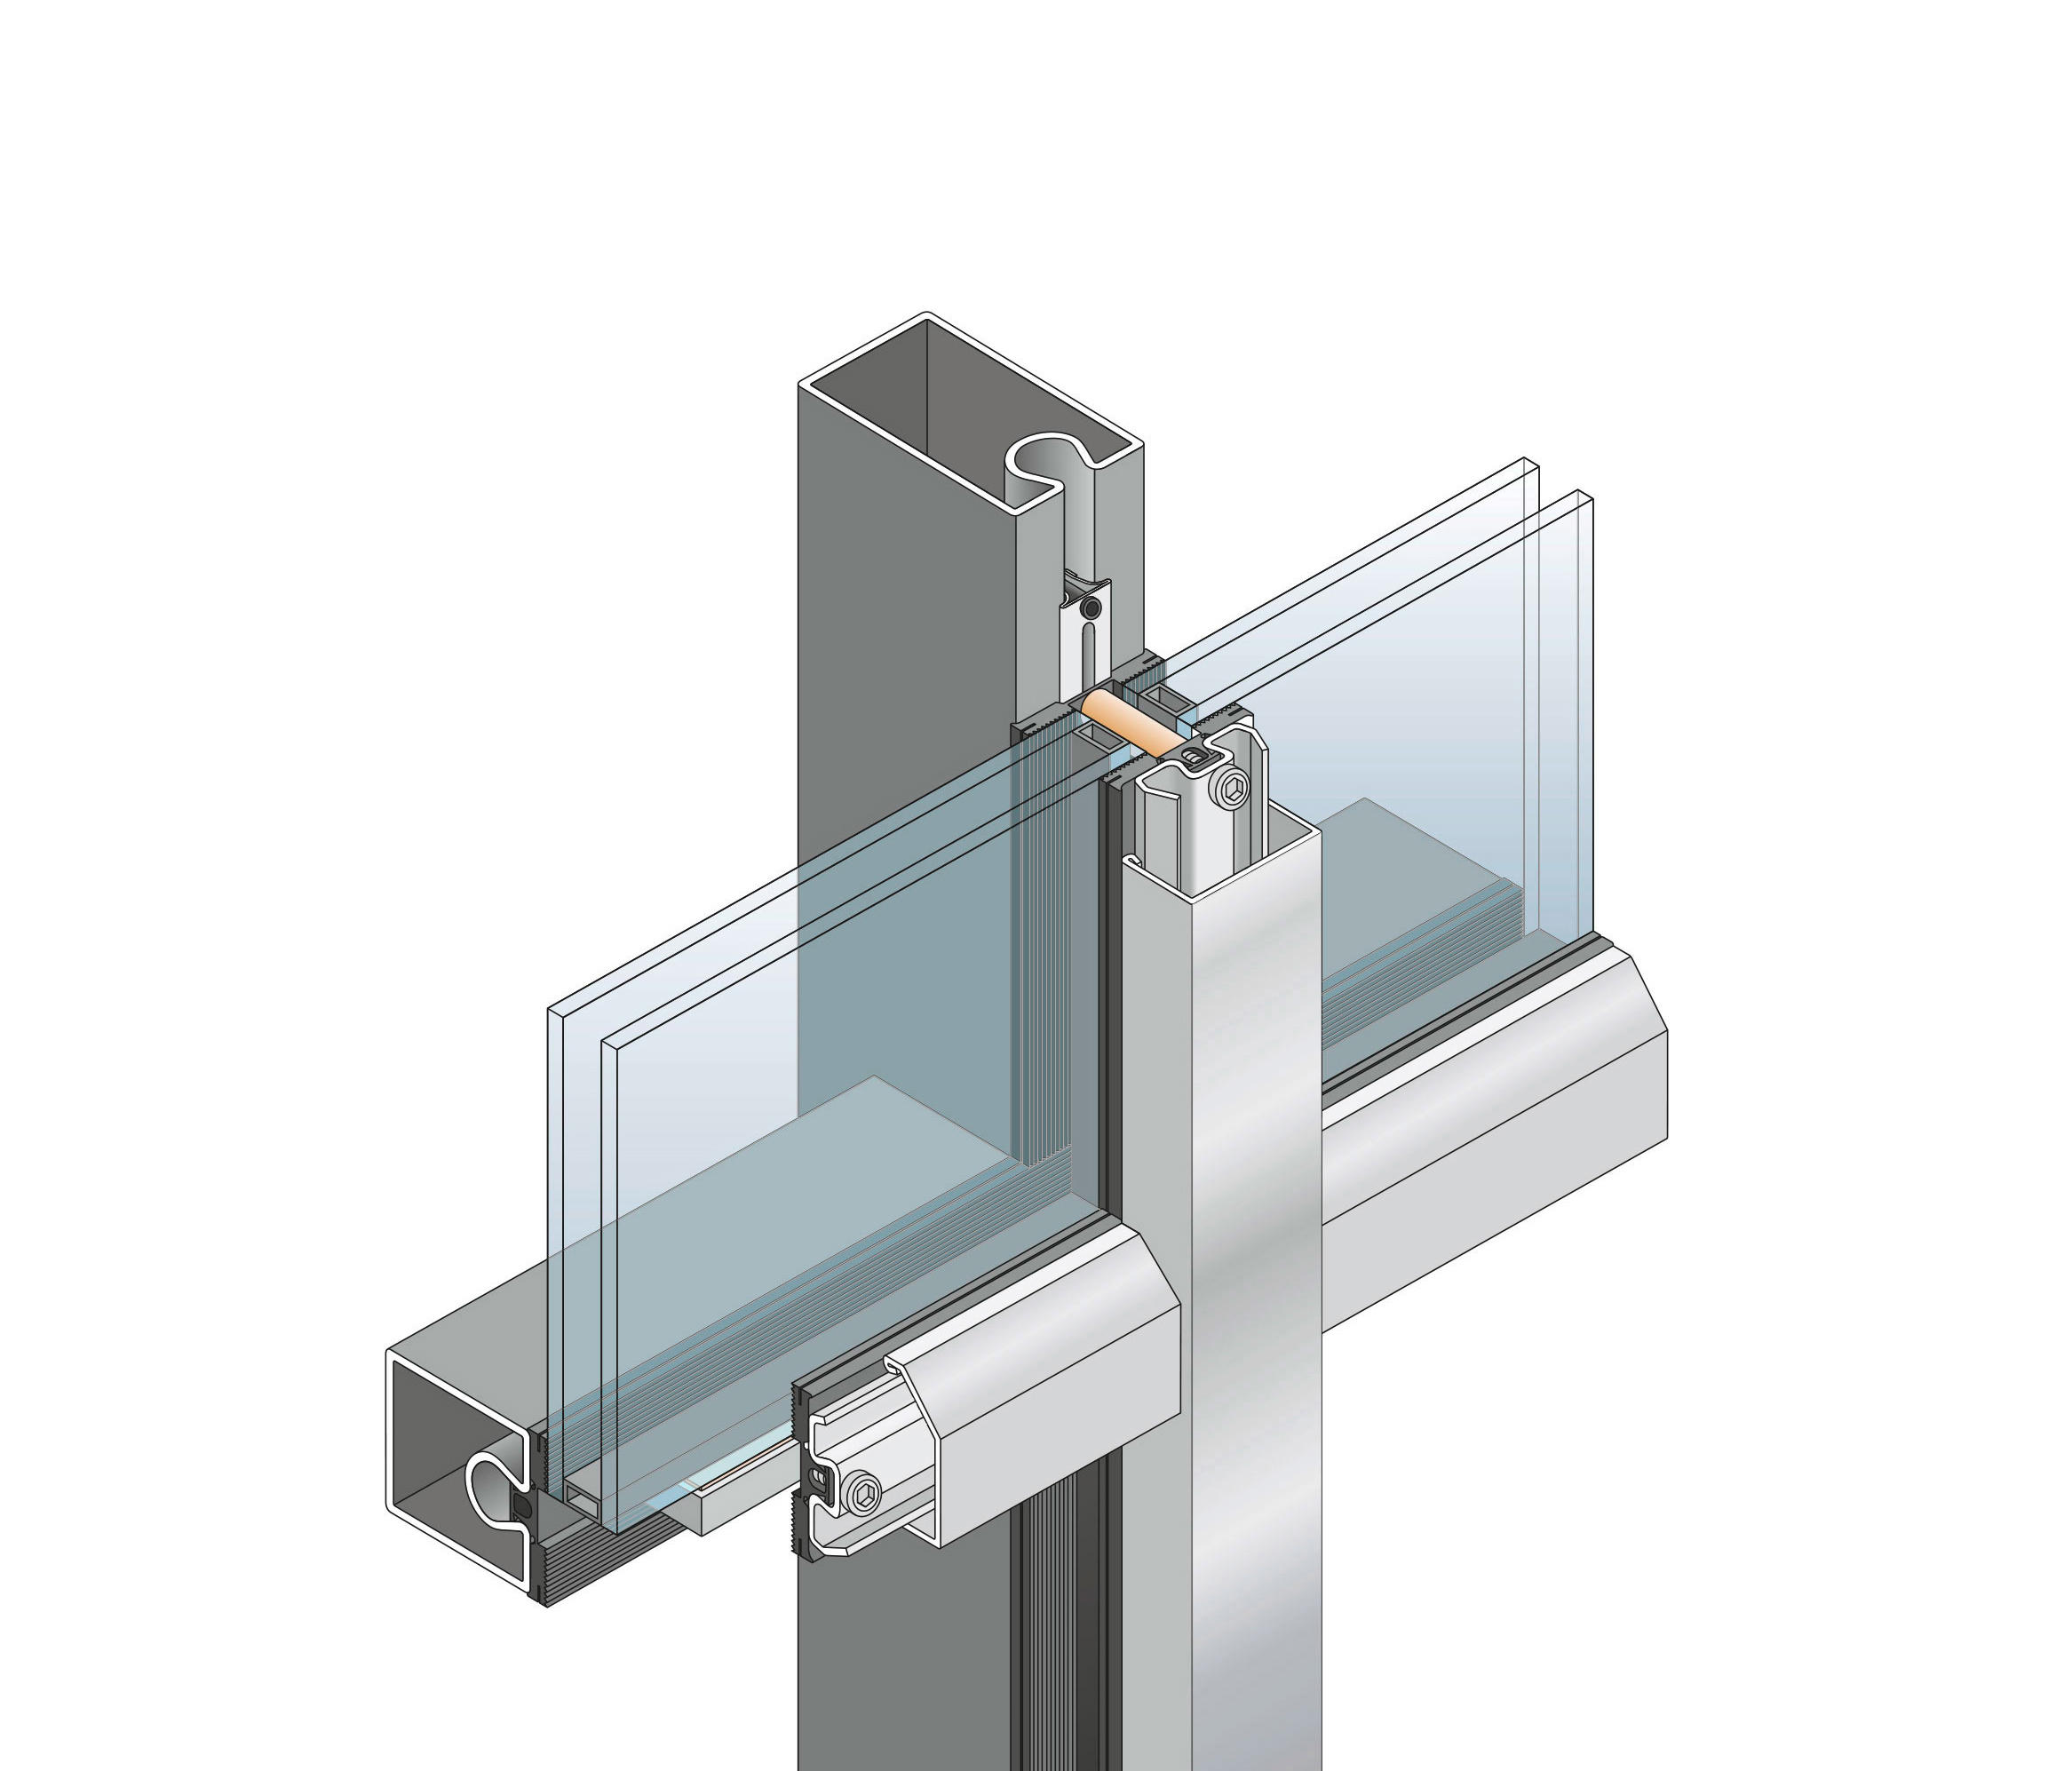 forster thermfix vario pfosten riegel fassade fassadensysteme von forster profile systems. Black Bedroom Furniture Sets. Home Design Ideas